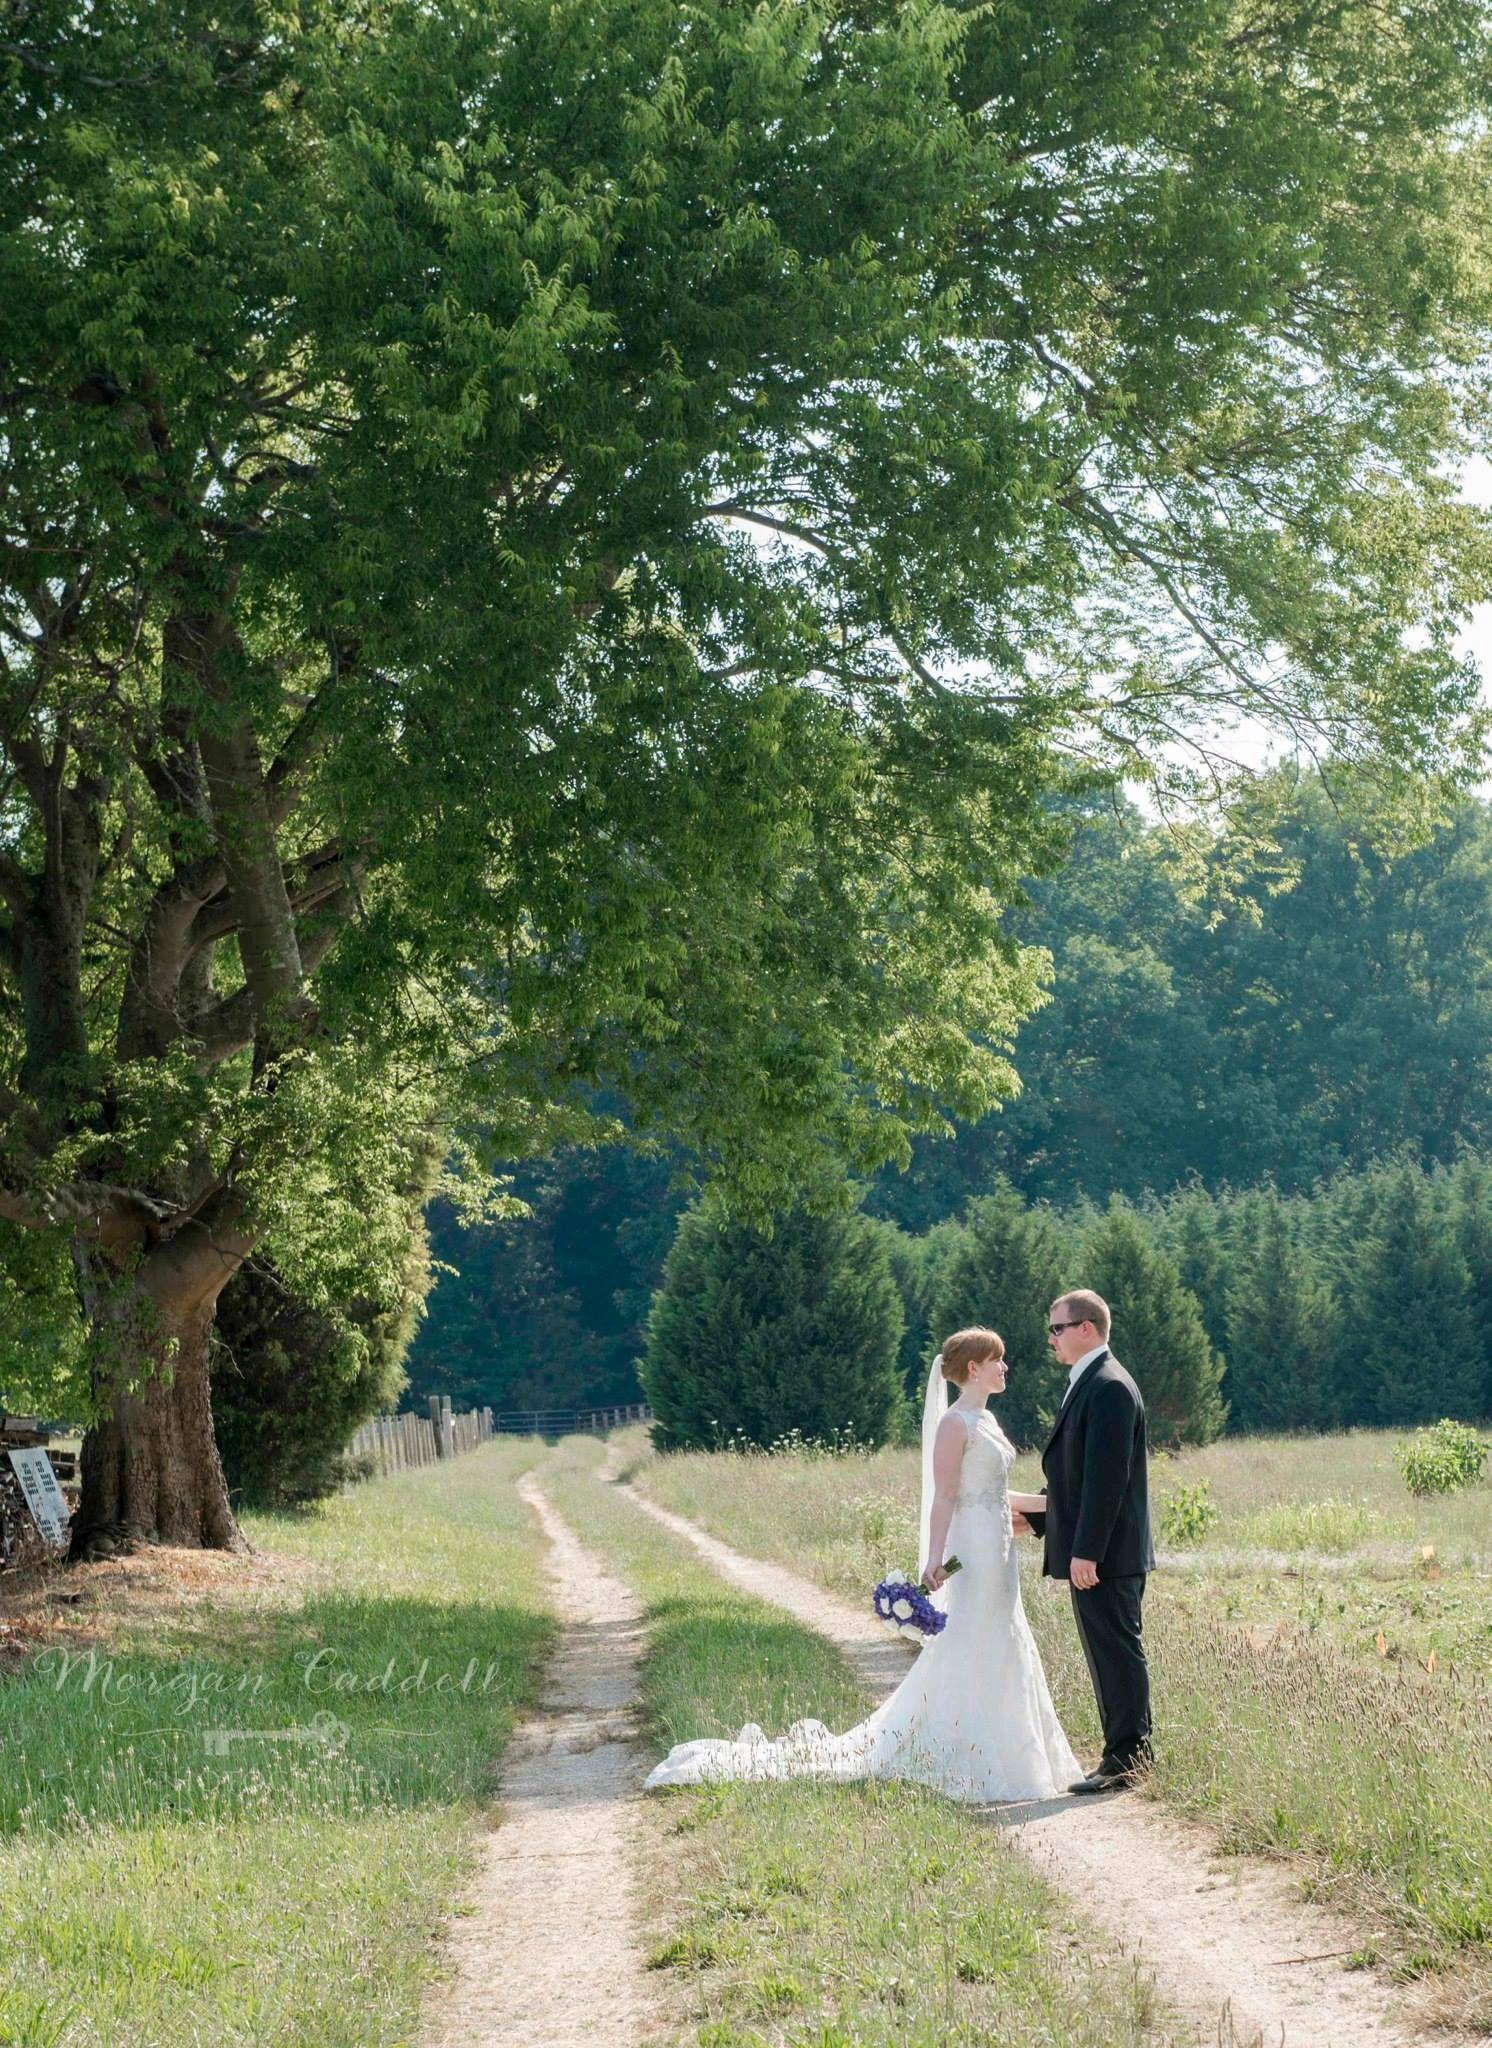 Pretty June day Wedding photos at the RandBryan House